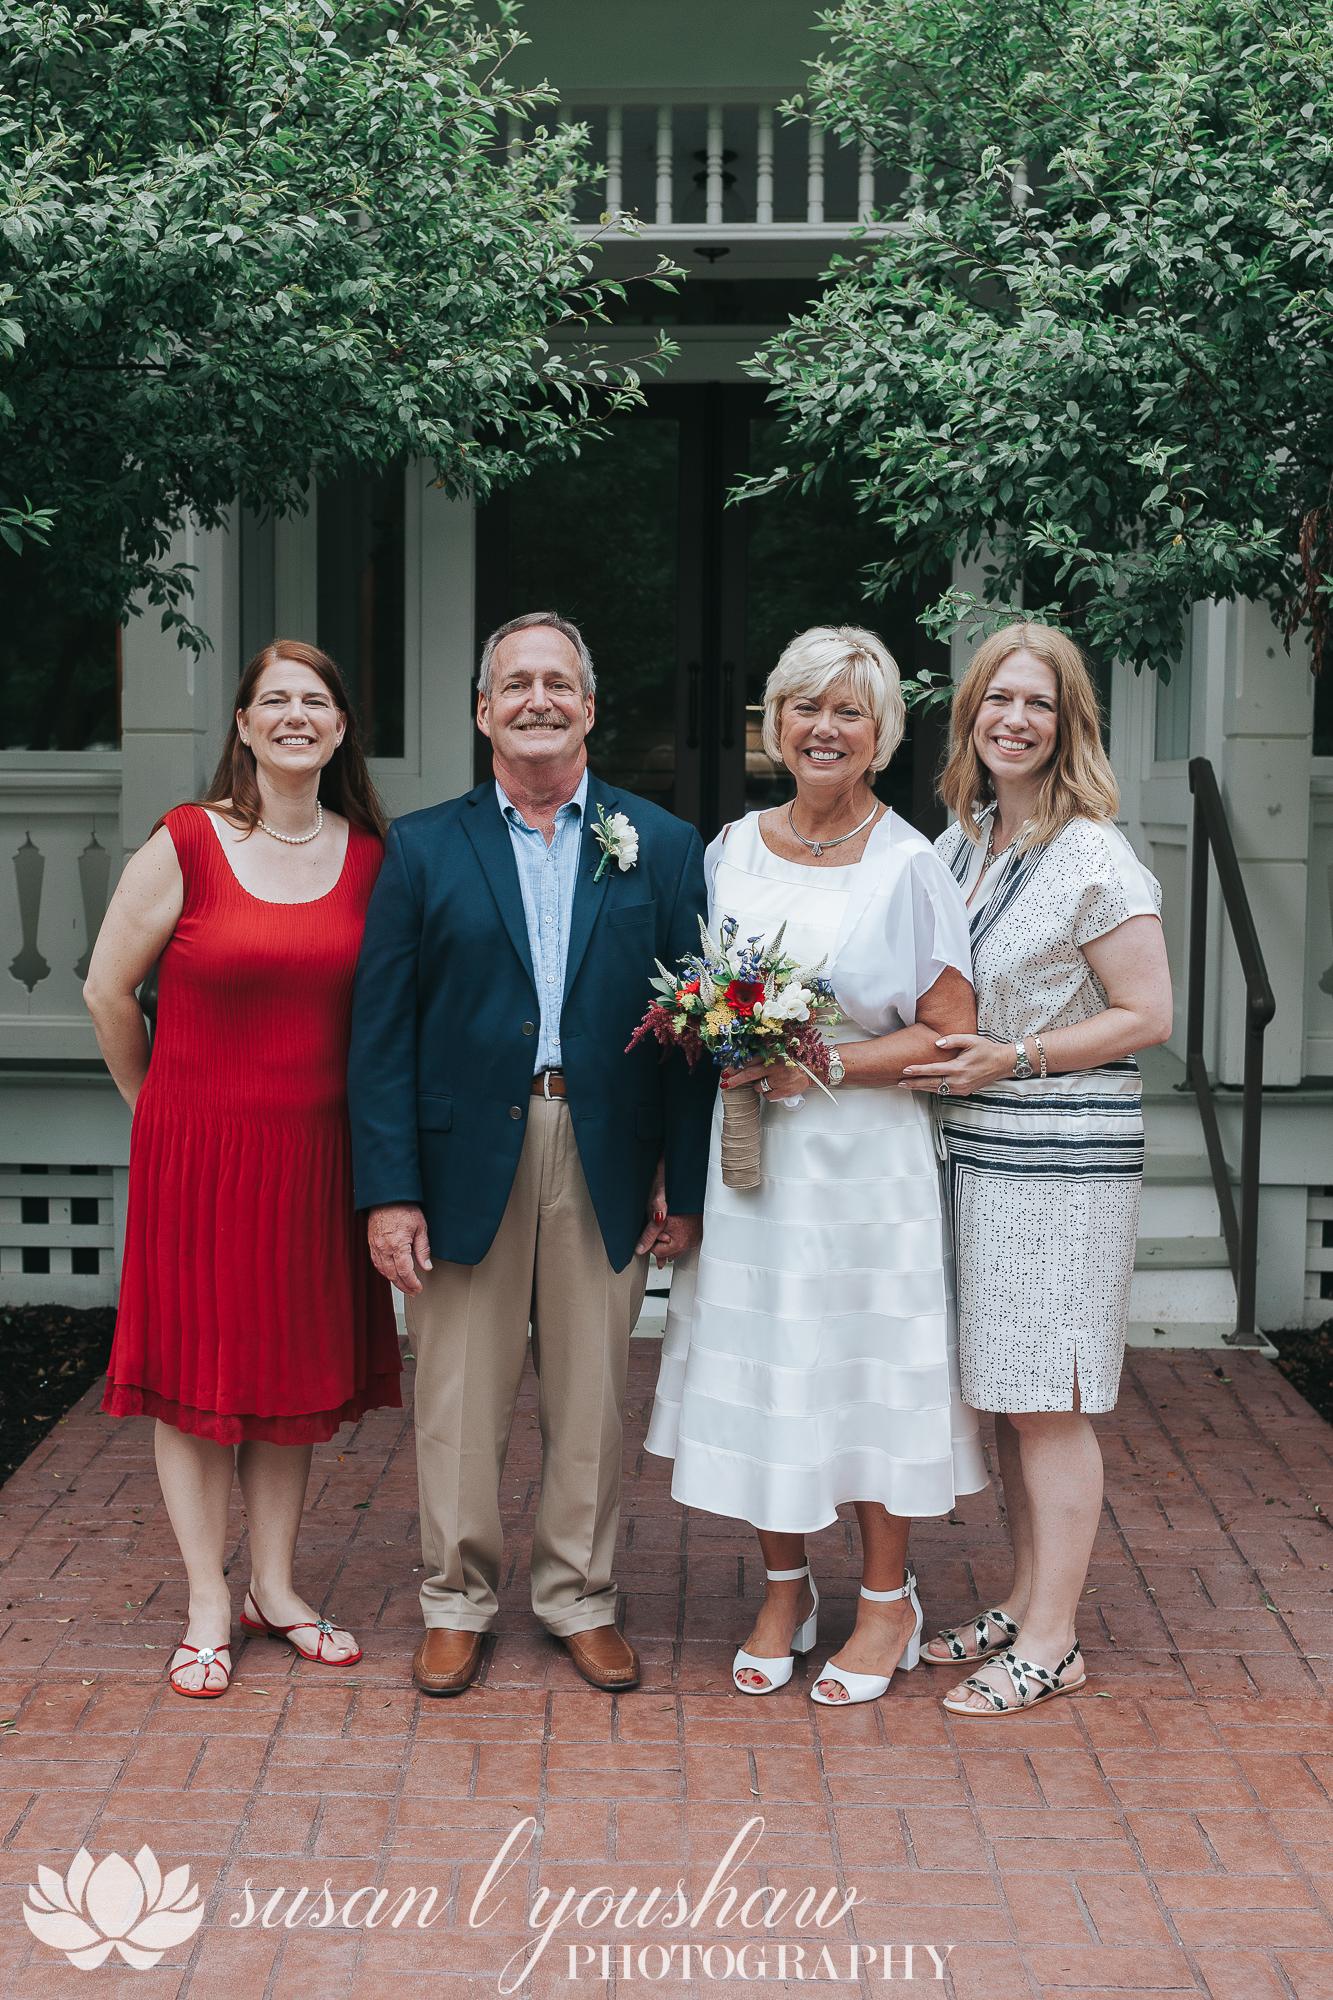 BLOG Carolyn Adams and Jim McCune 07-04-2018 SLY Photography-109.jpg